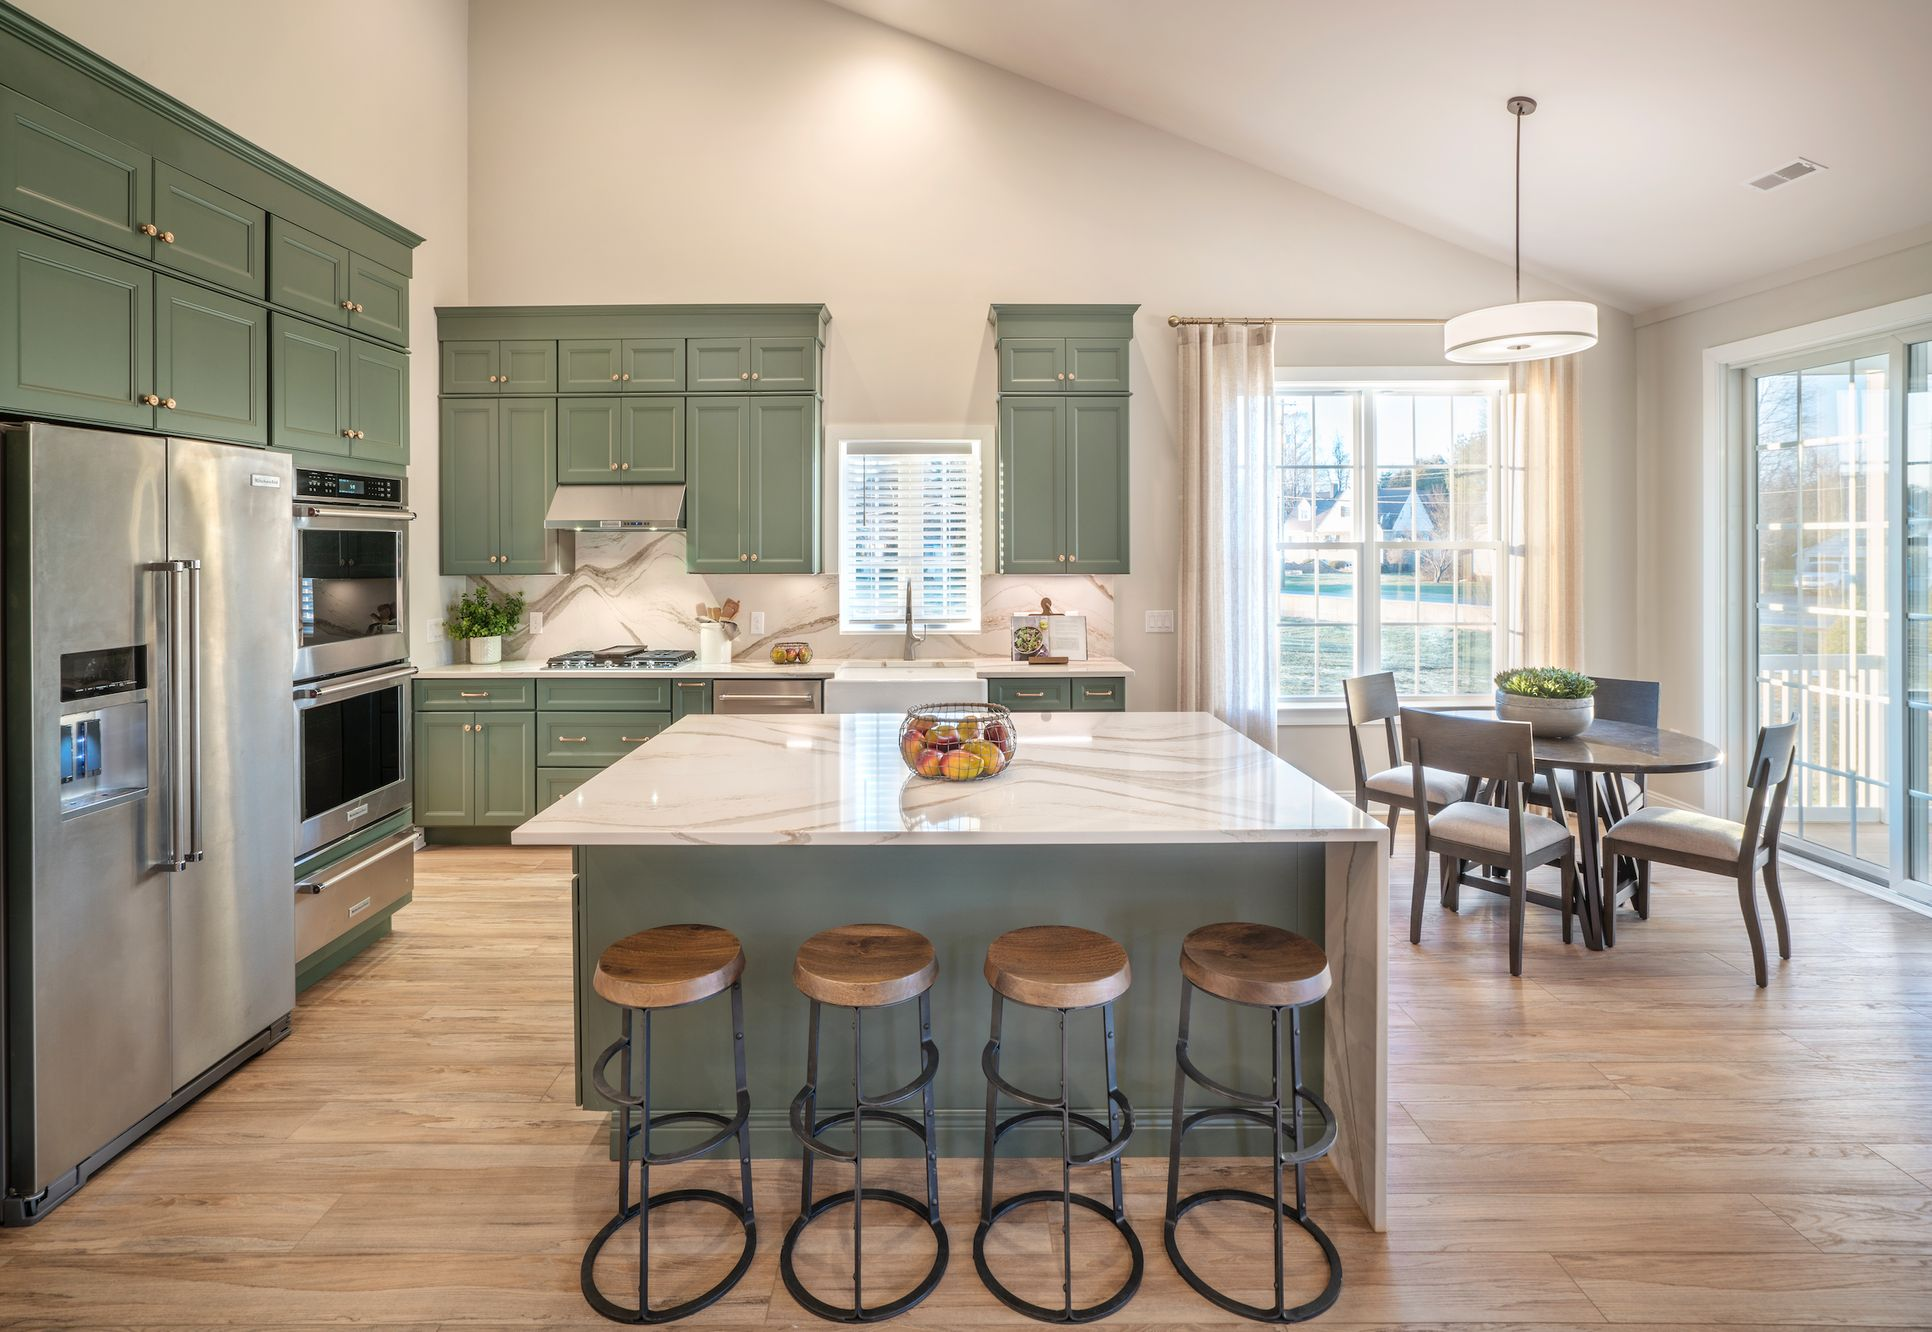 Green Pond Designer Model Home:Amazing Kitchen in The Hancock Model